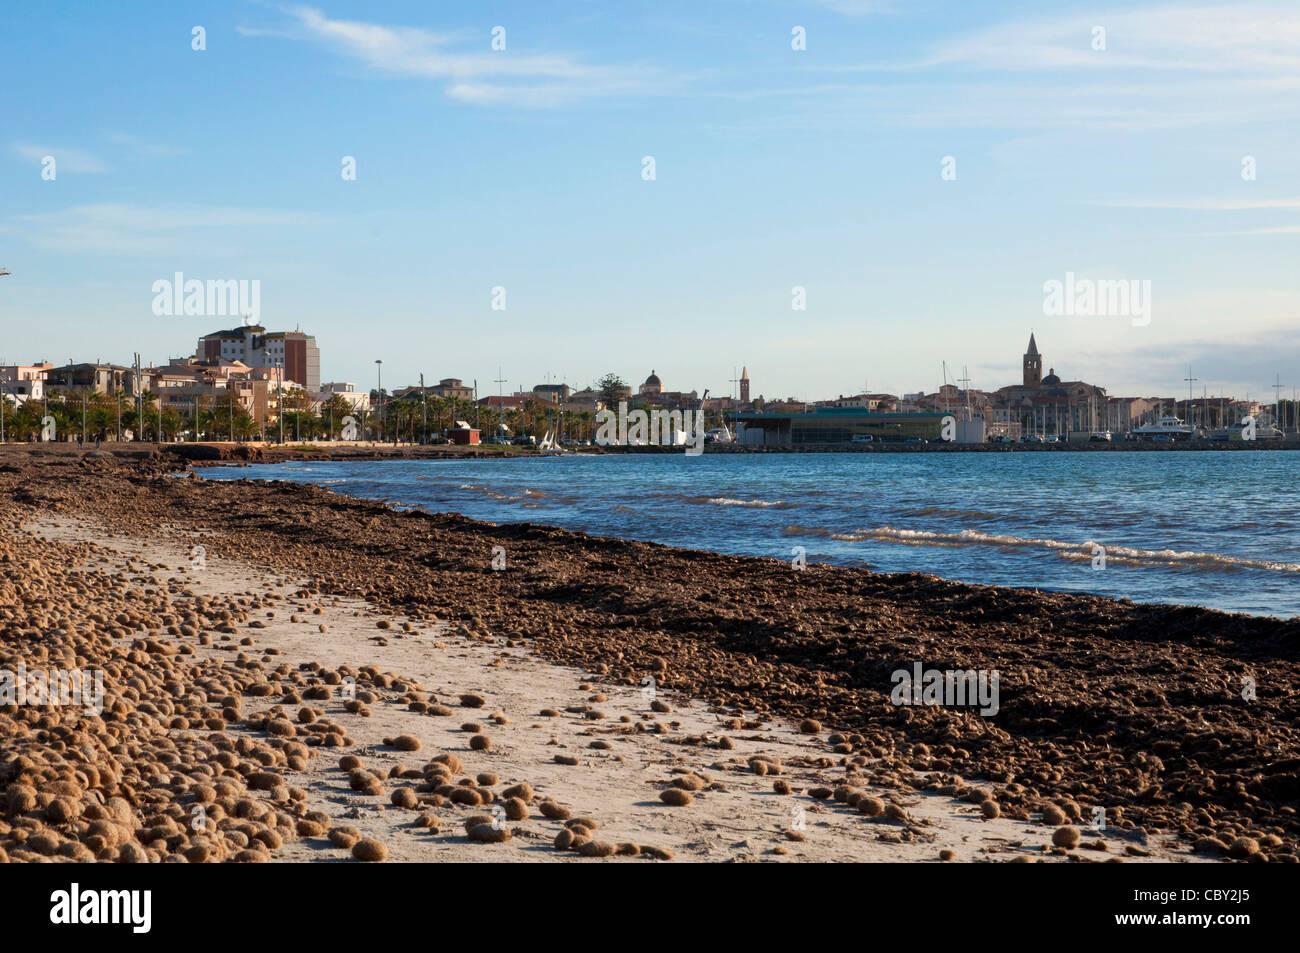 Lido San Giovanni High Resolution Stock Photography And Images Alamy